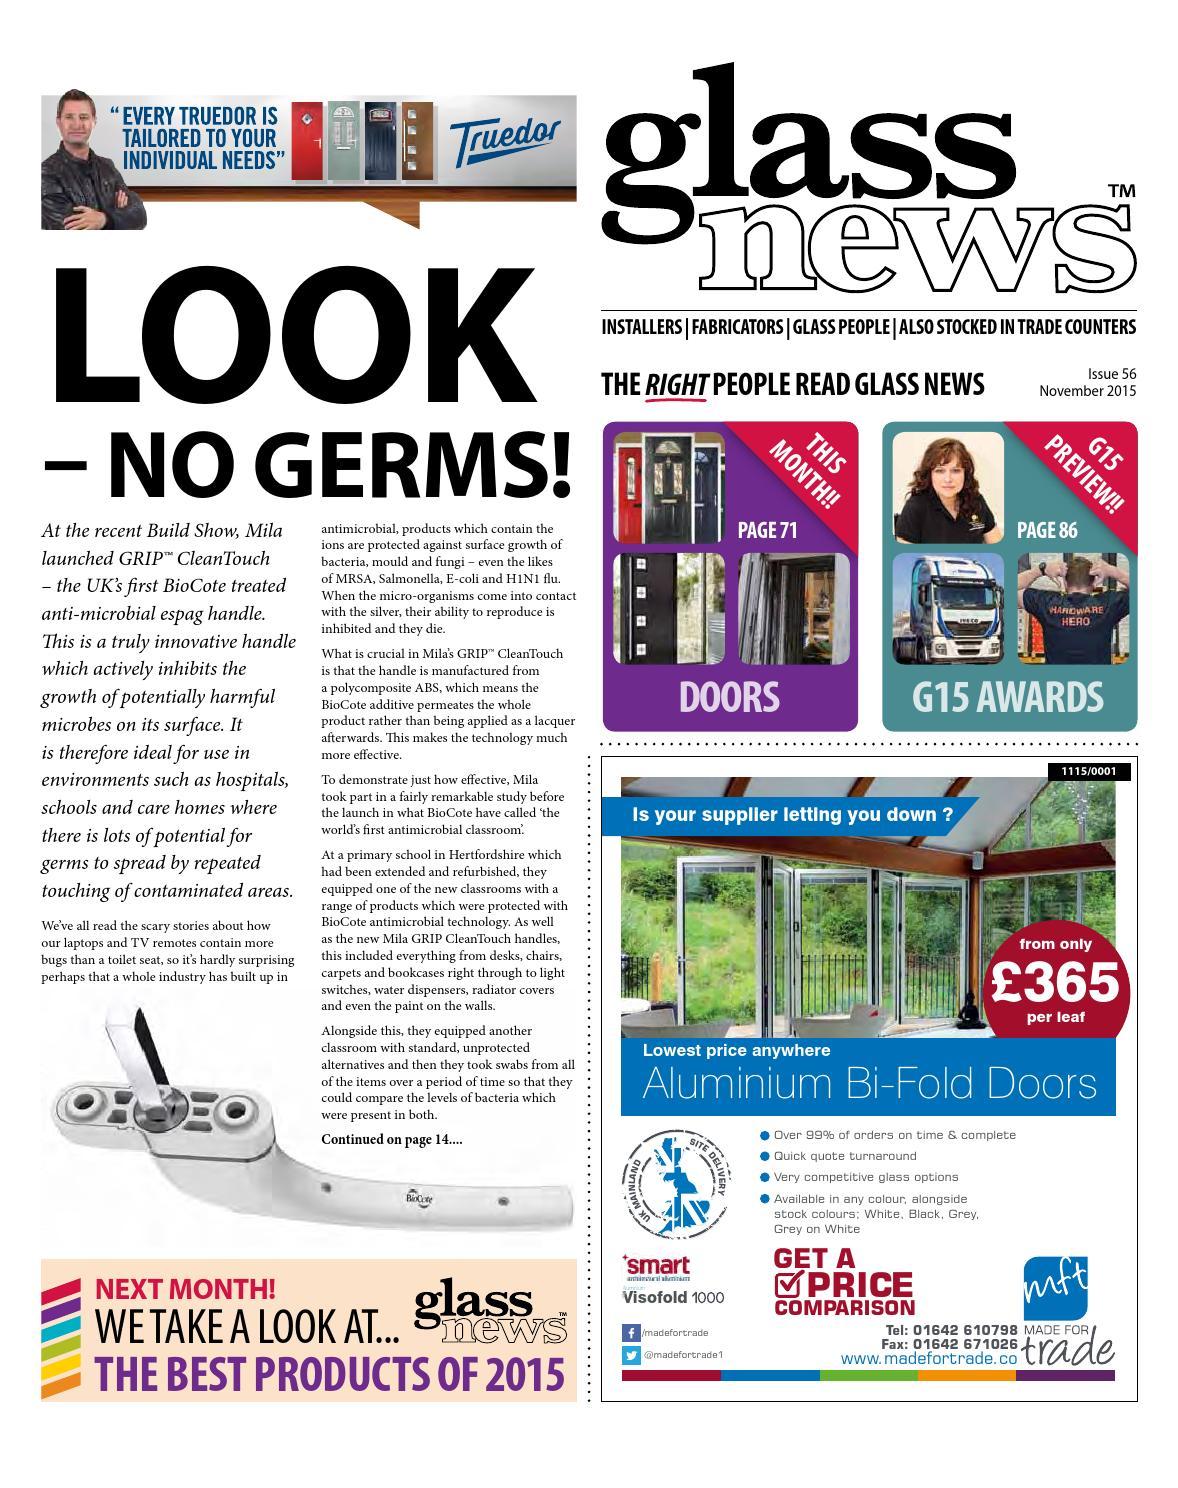 Glass News November 2015 by Christina Shaw - issuu